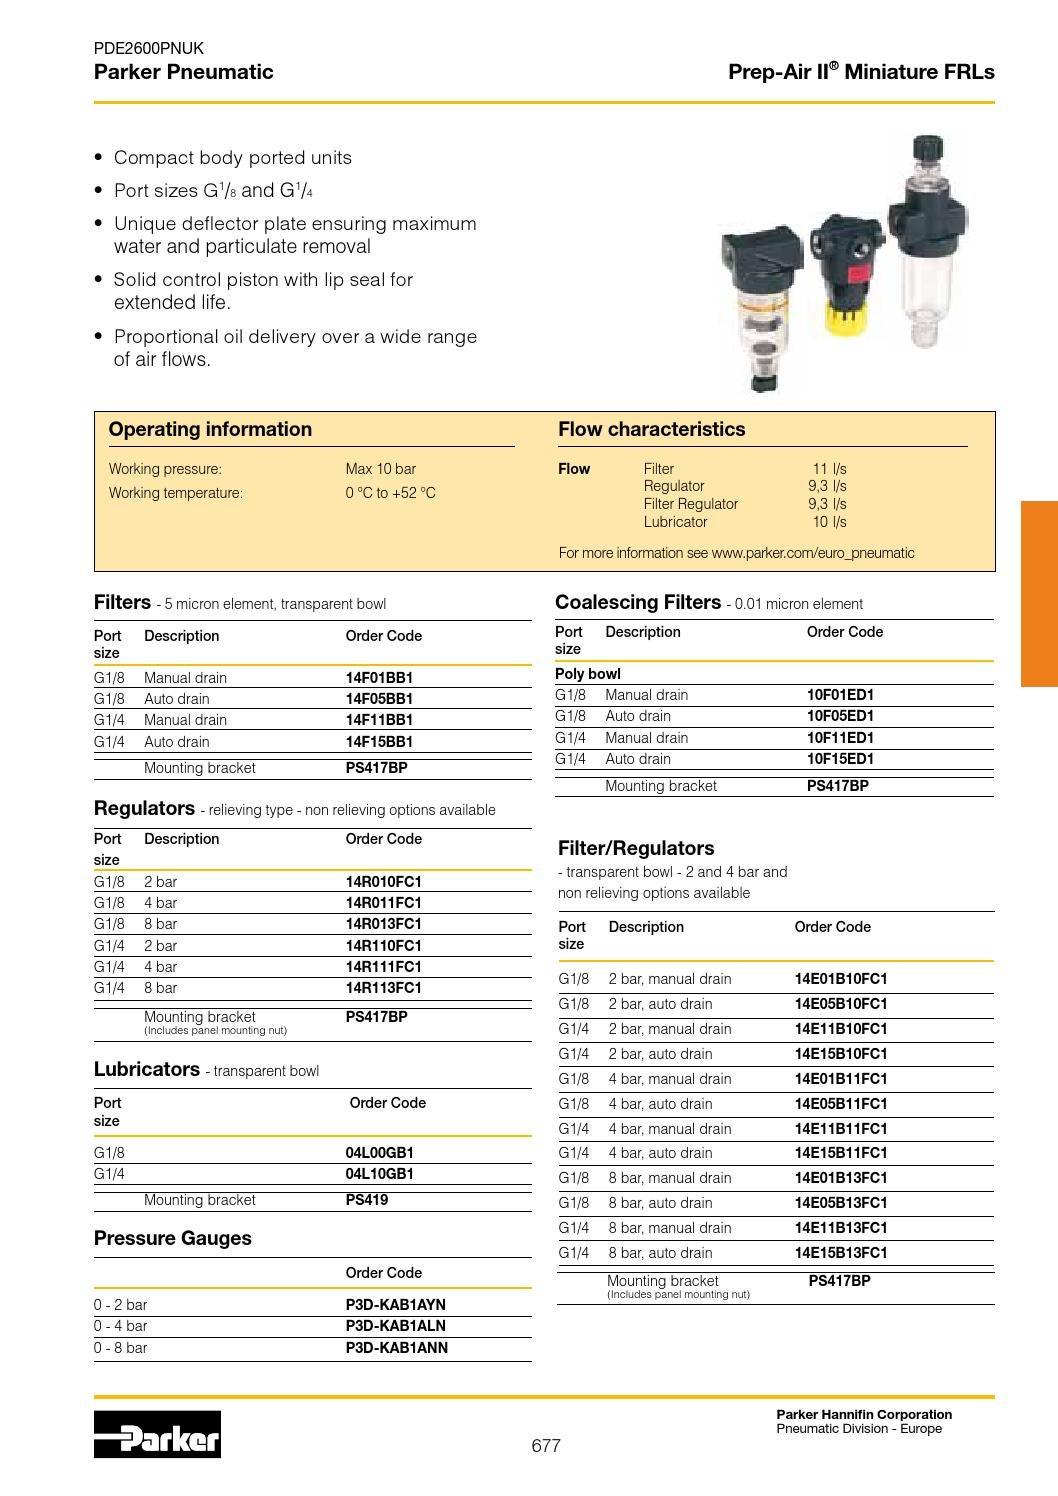 parker pneumatic catalogue deel 2 by wiltec b v issuu rh issuu com MIT Physics 8.01 Virginia Code 8.01 581.15